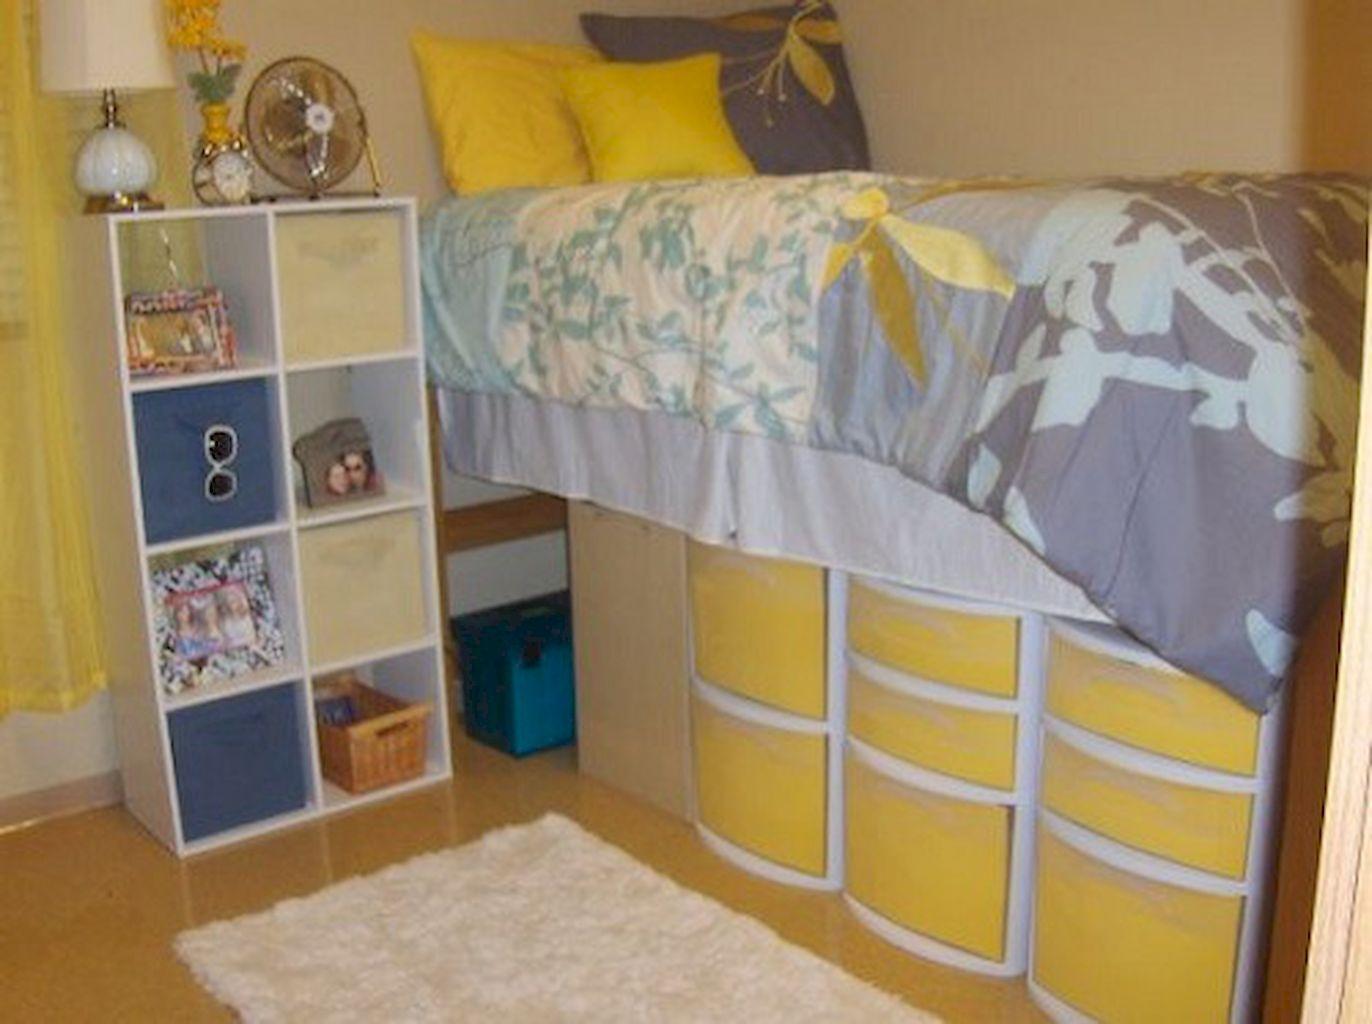 60 Tips And Tricks Dorm Room Organization Storage Ideas On A Budget